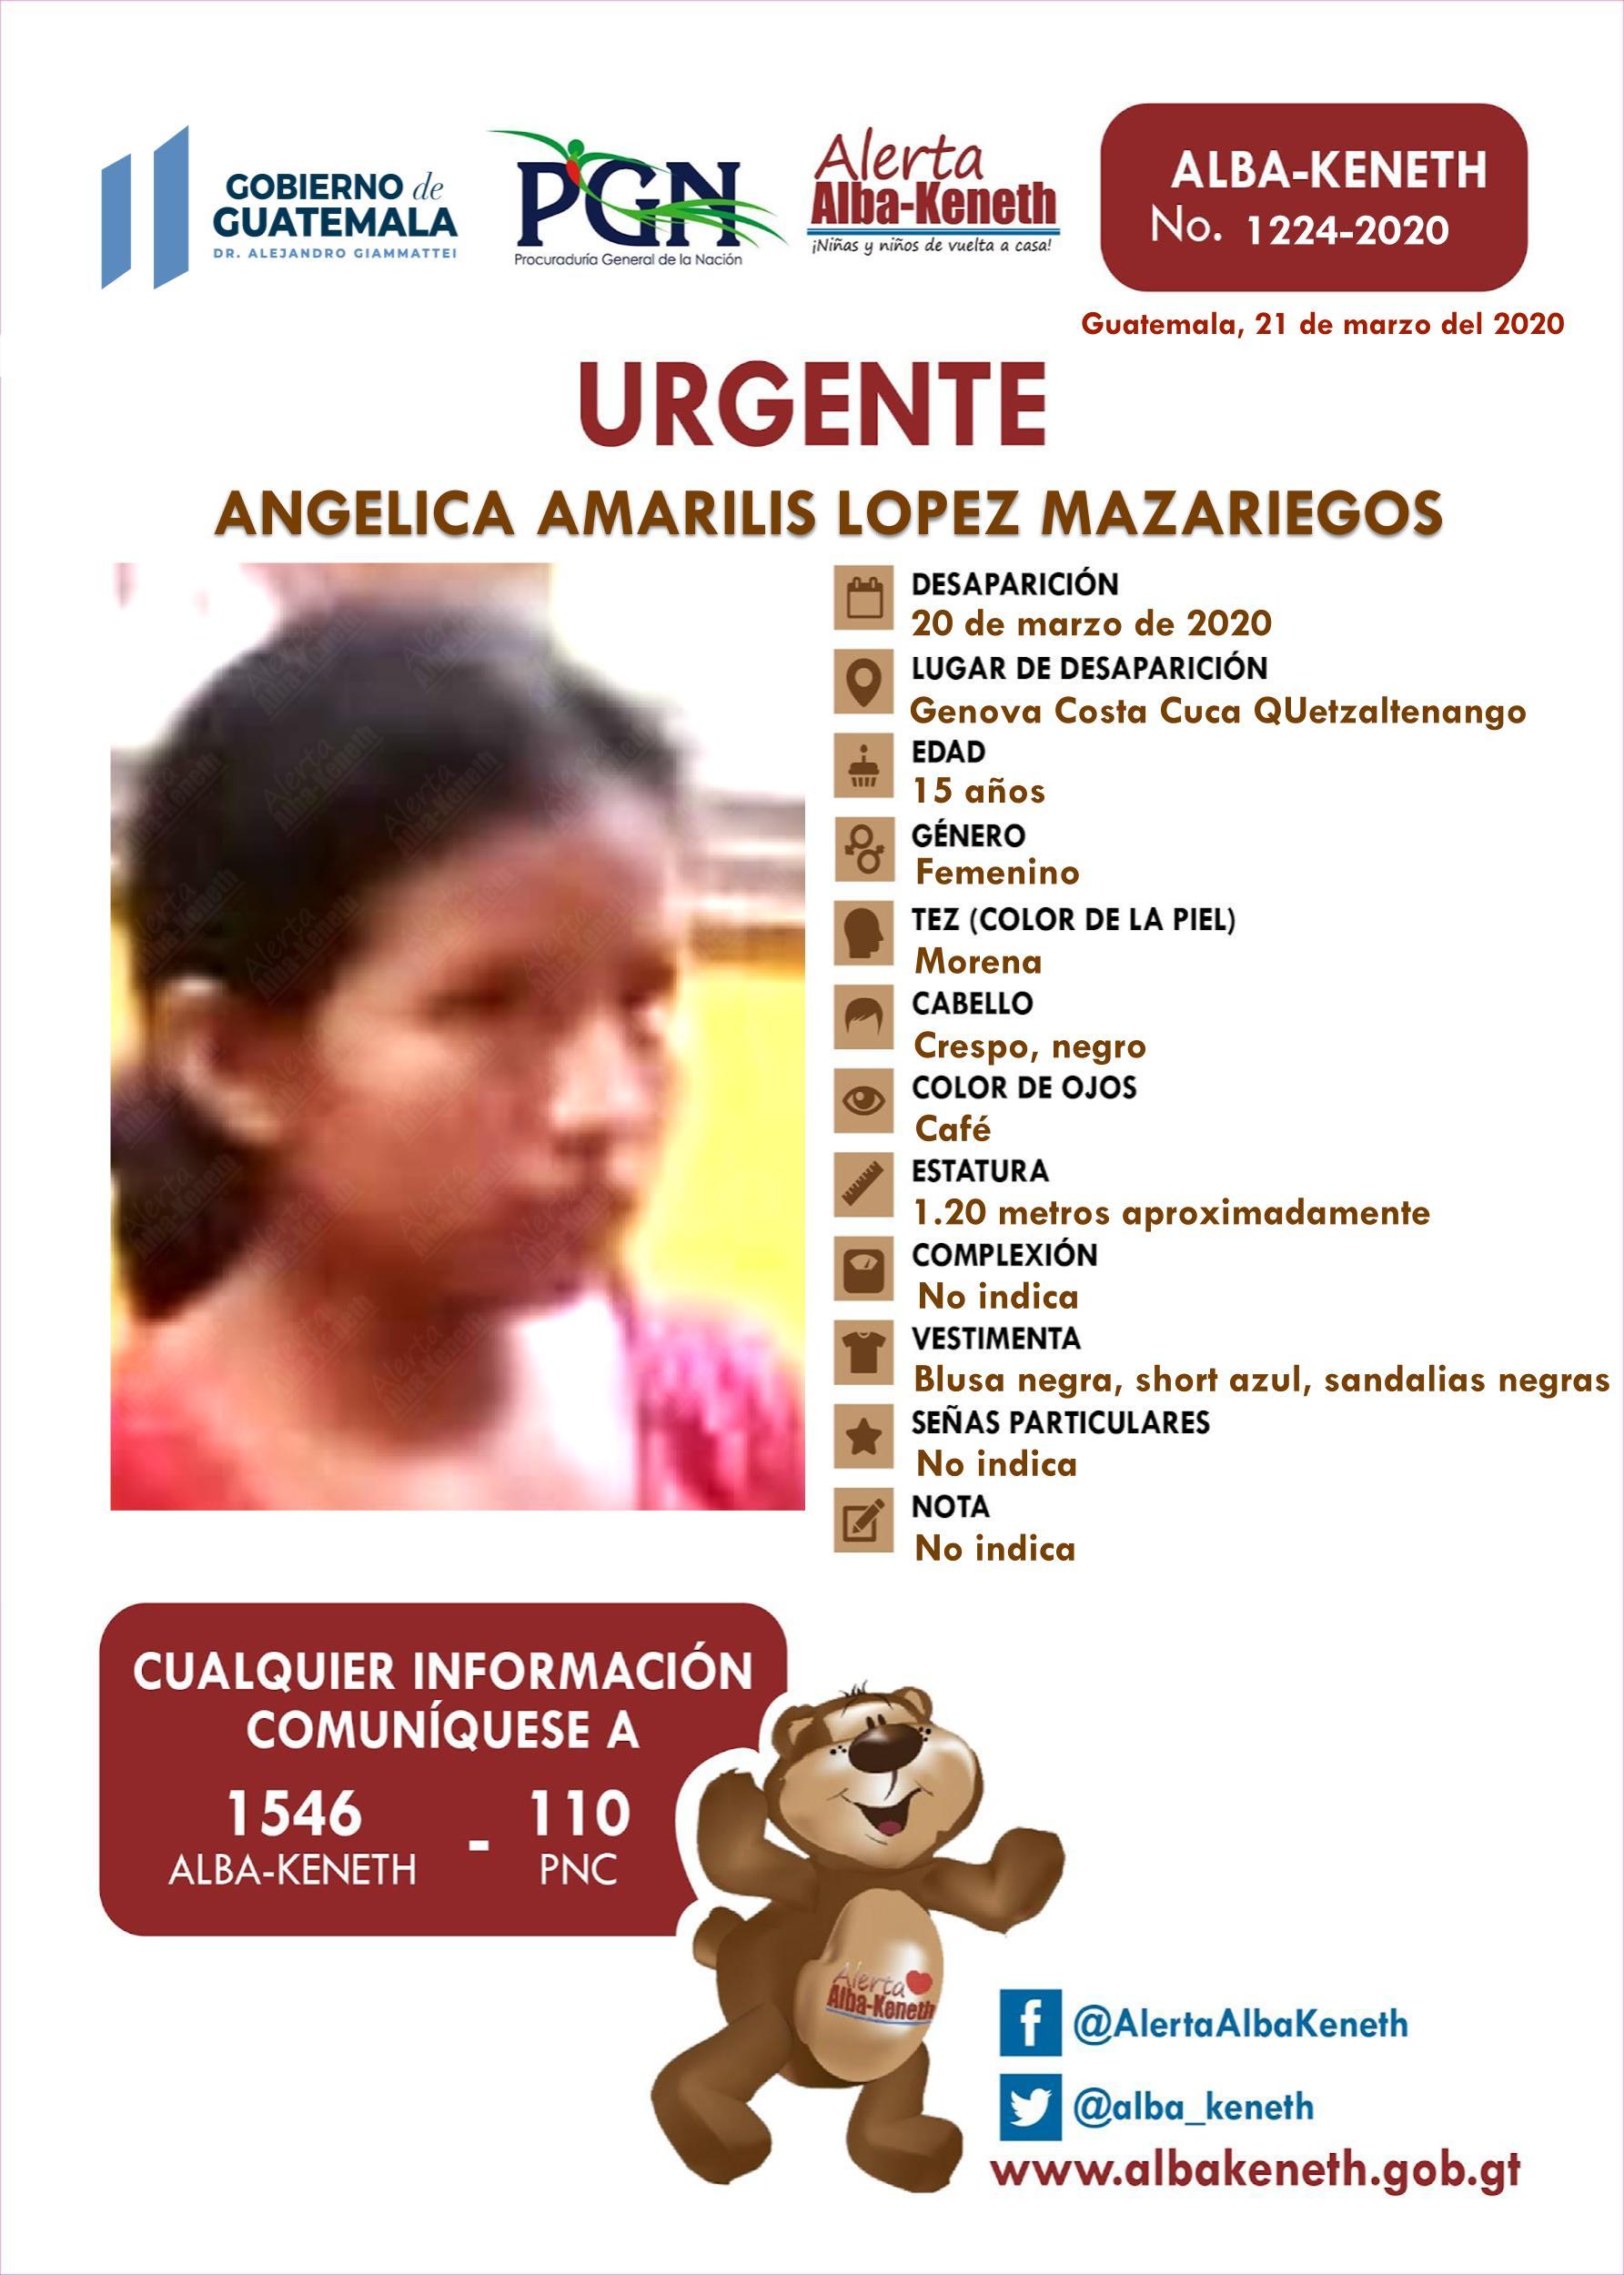 Angelica Amarilis Lopez Mazariegos